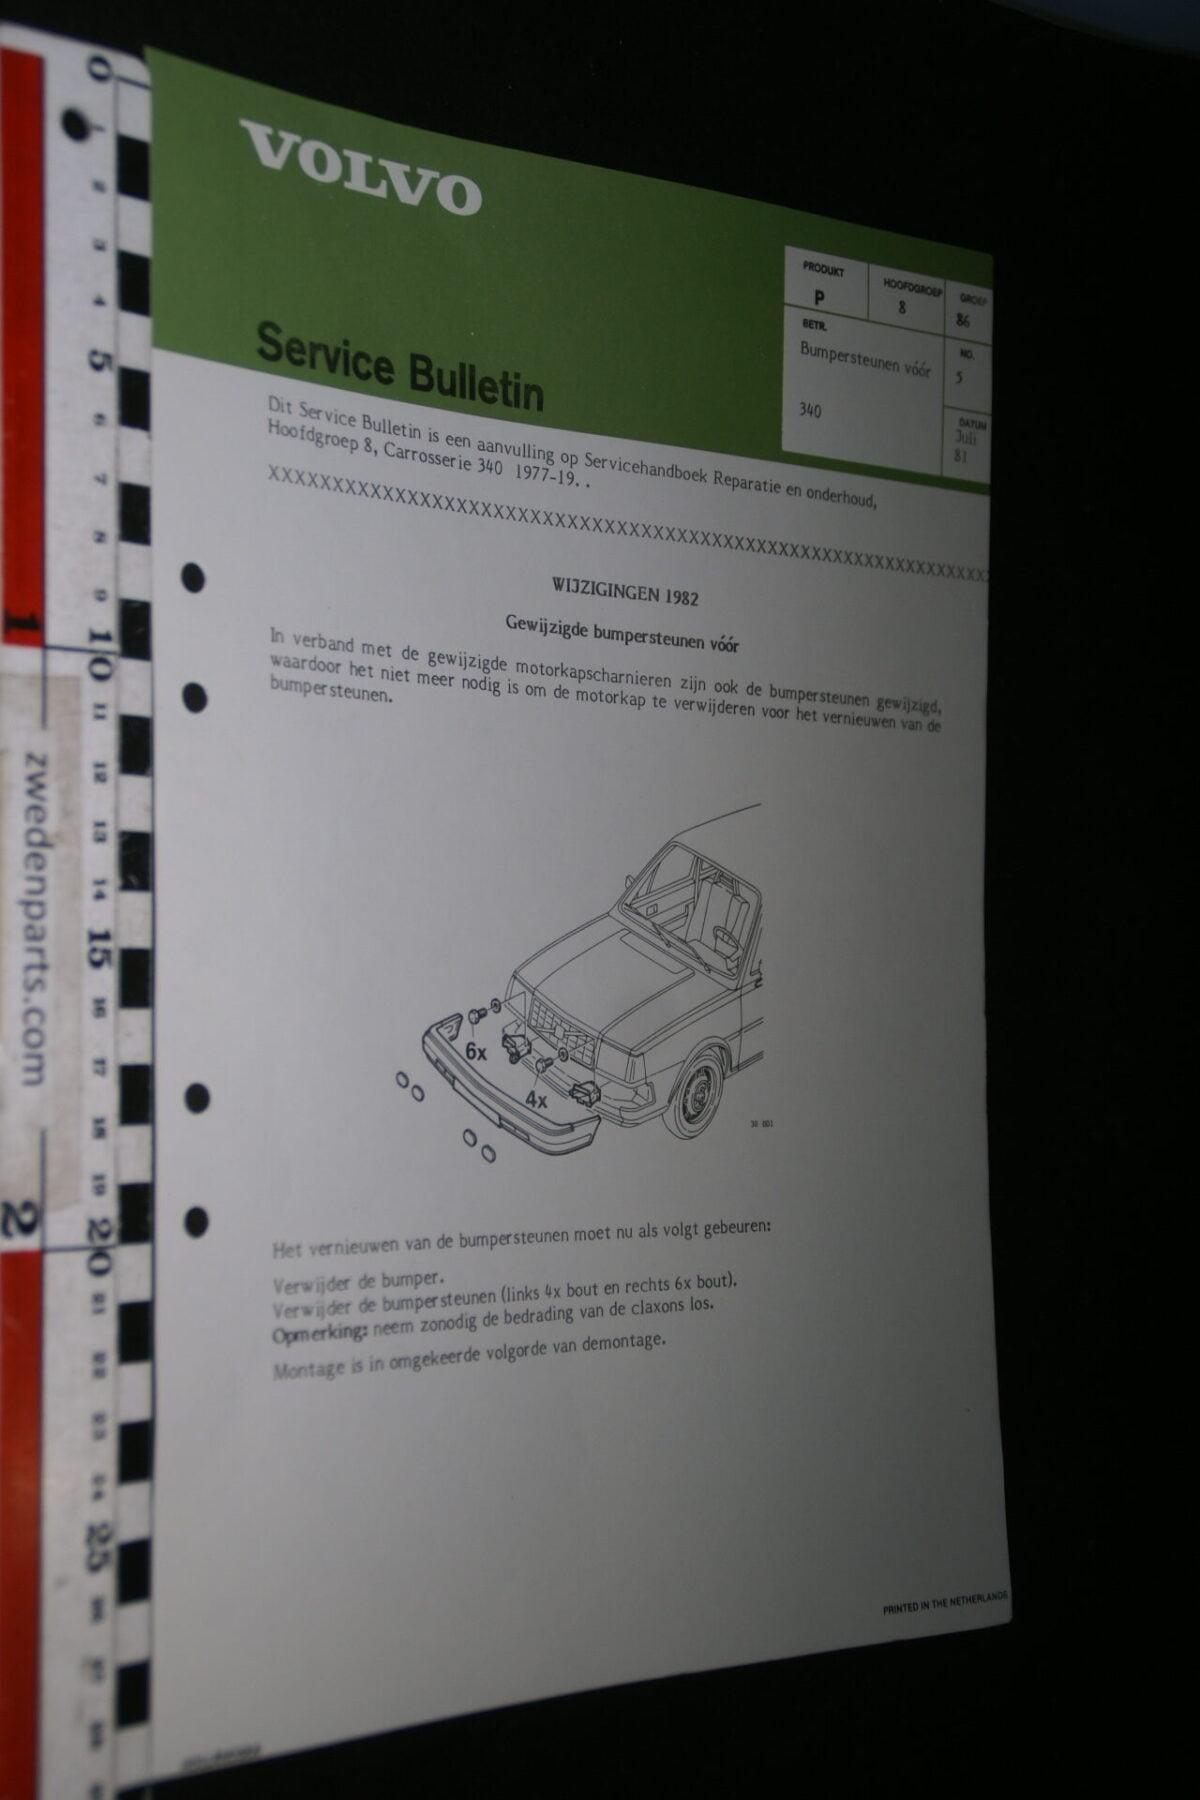 DSC07665 1981 origineel Volvo 340 werkplaatsboek servicebulletin 8-86 bumpersteunen vóór-baad5b5a